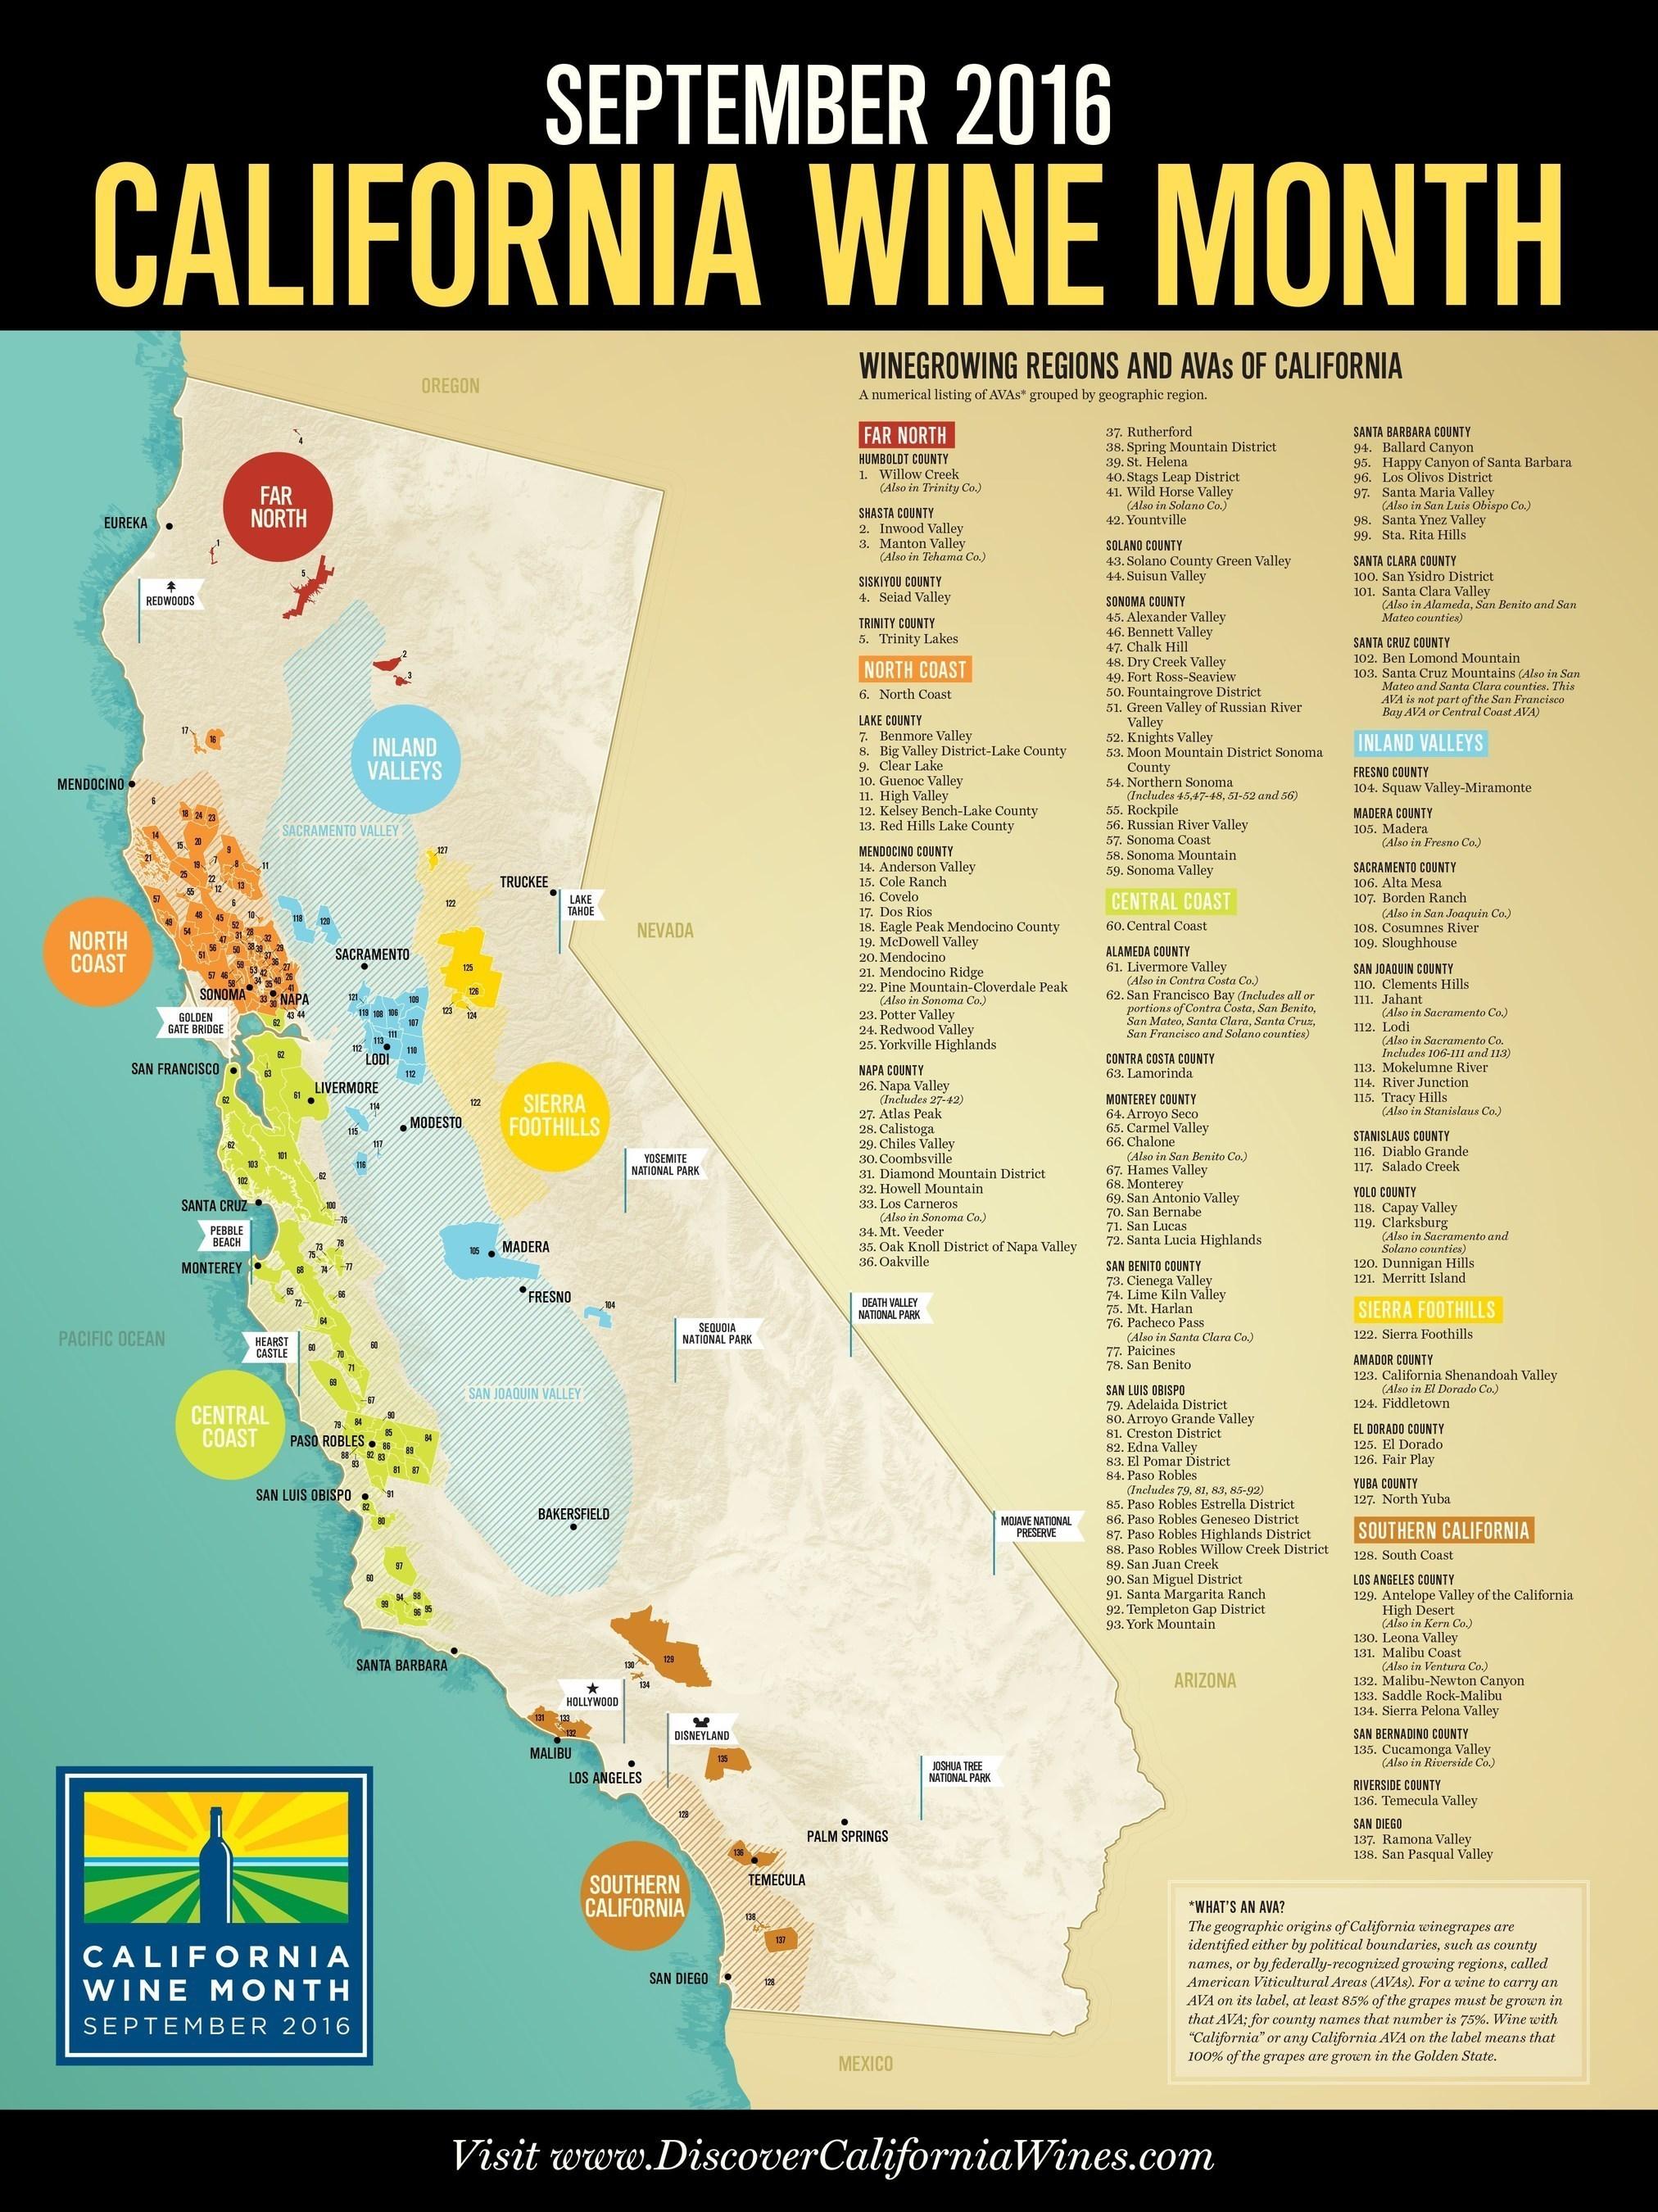 Wine Institute Wine Month 2016 Infographic